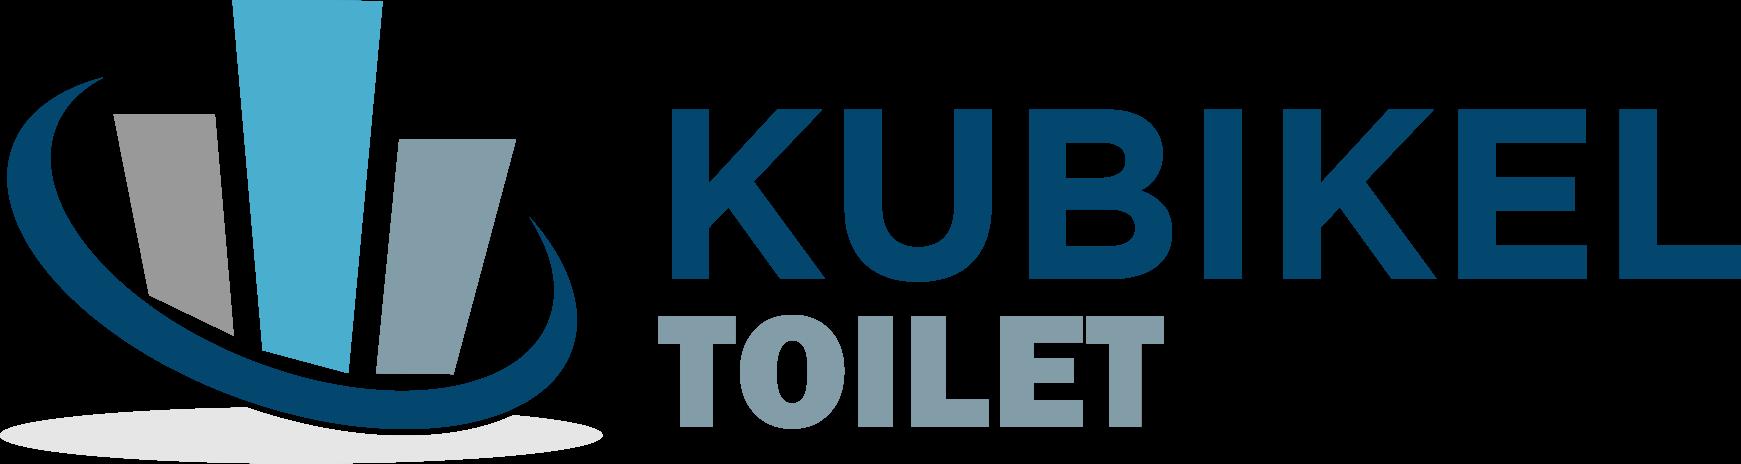 Kubikel Toilet